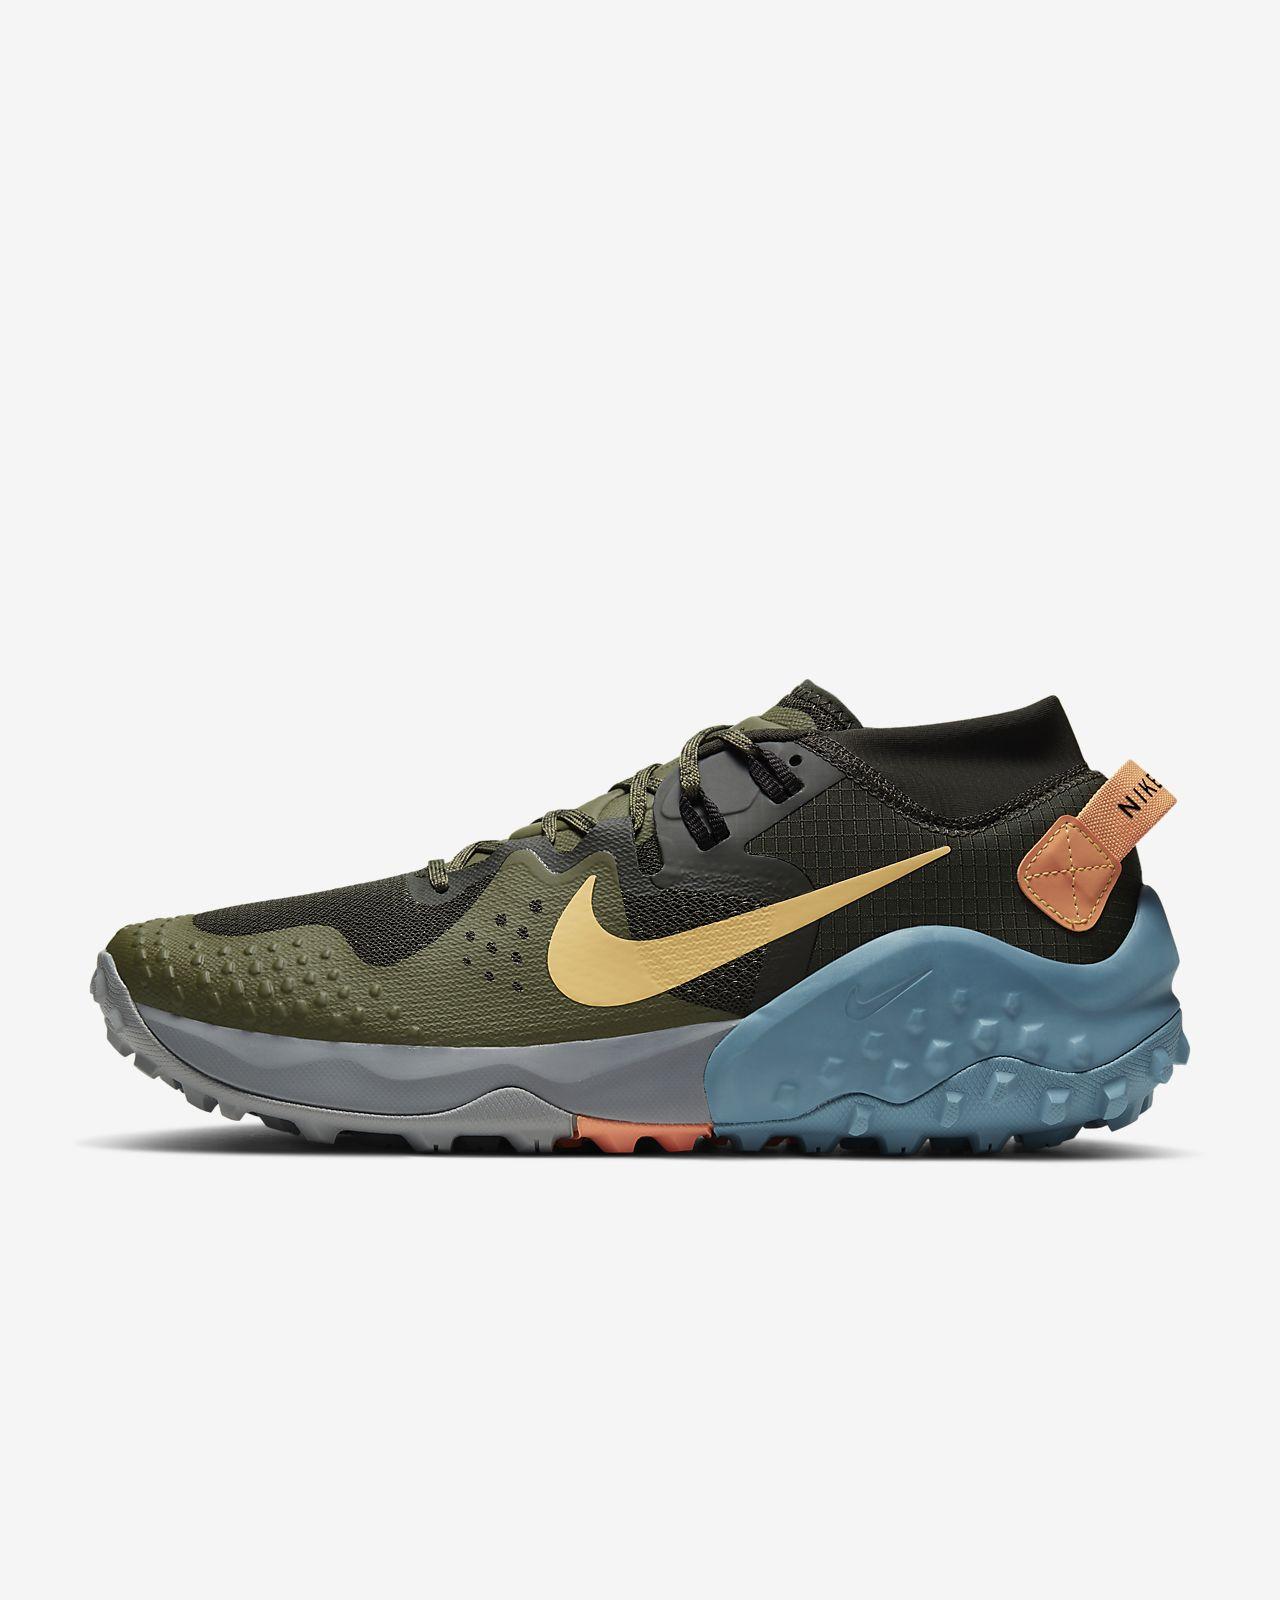 Nike Wildhorse 6 Men's Trail Running Shoe